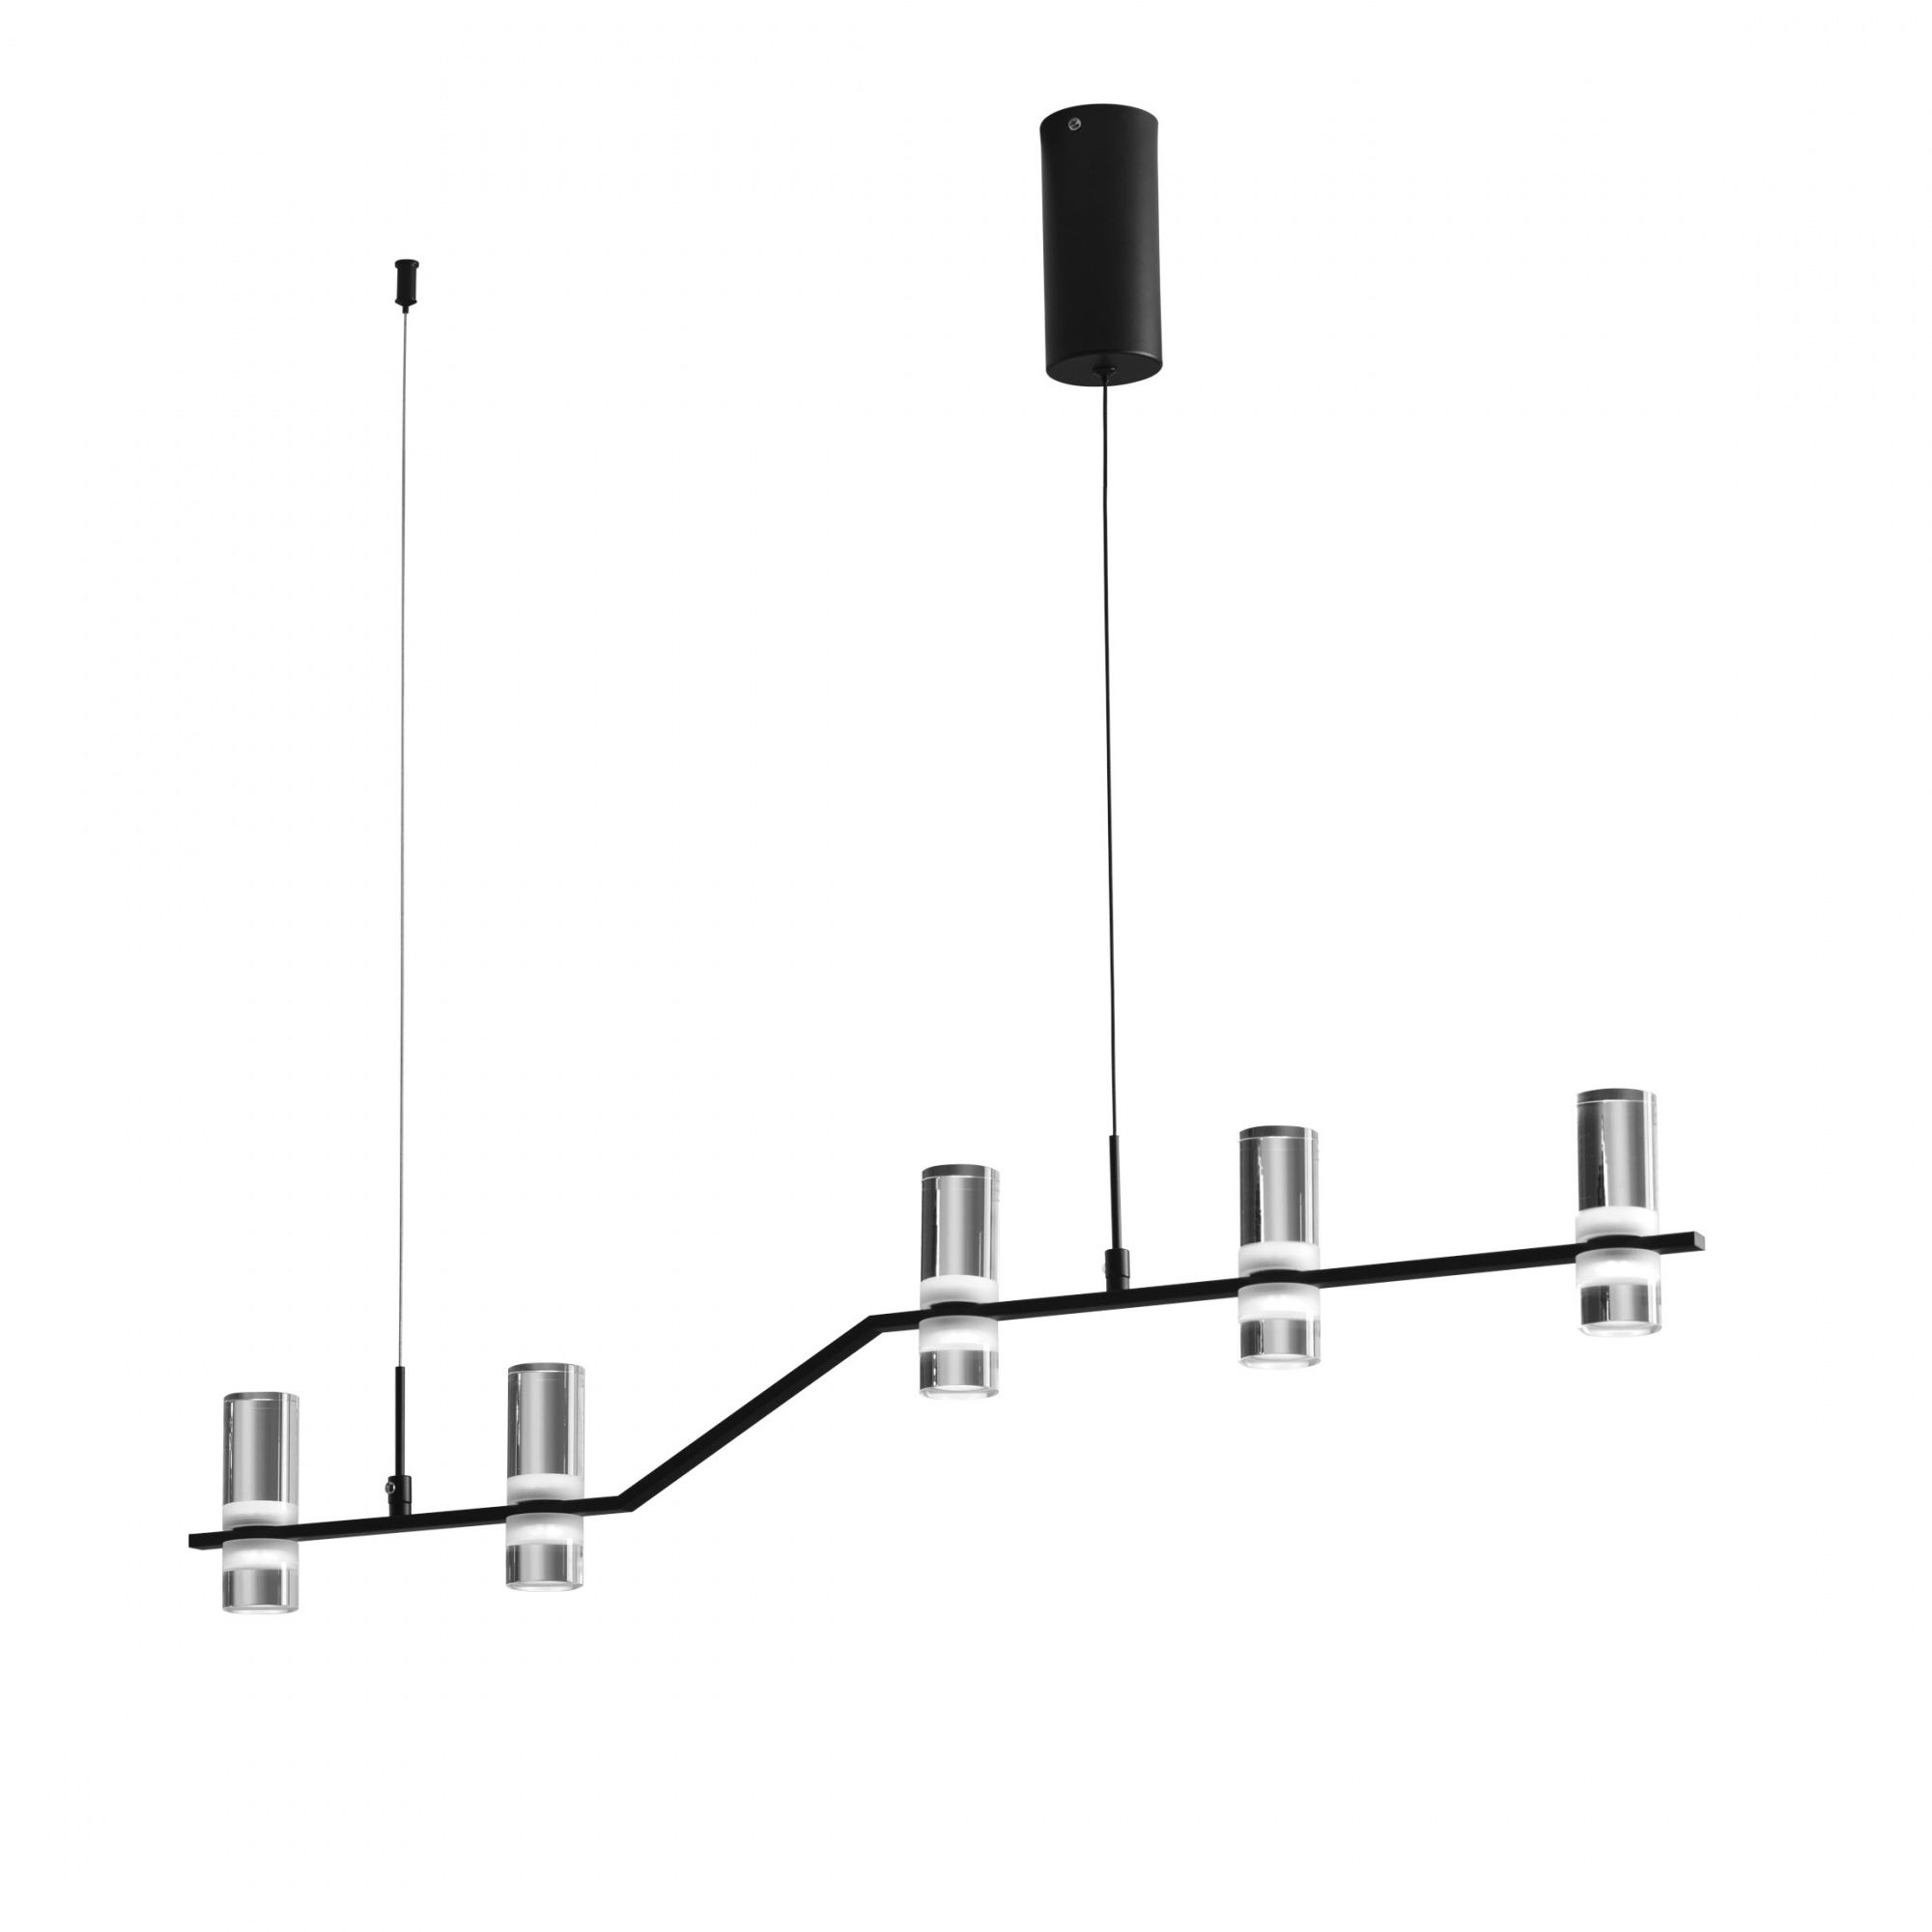 Lampa wisząca Kingfort 0084.30.NE VIVIDA International efektowna lampa wisząca czarna LED 5 kloszy